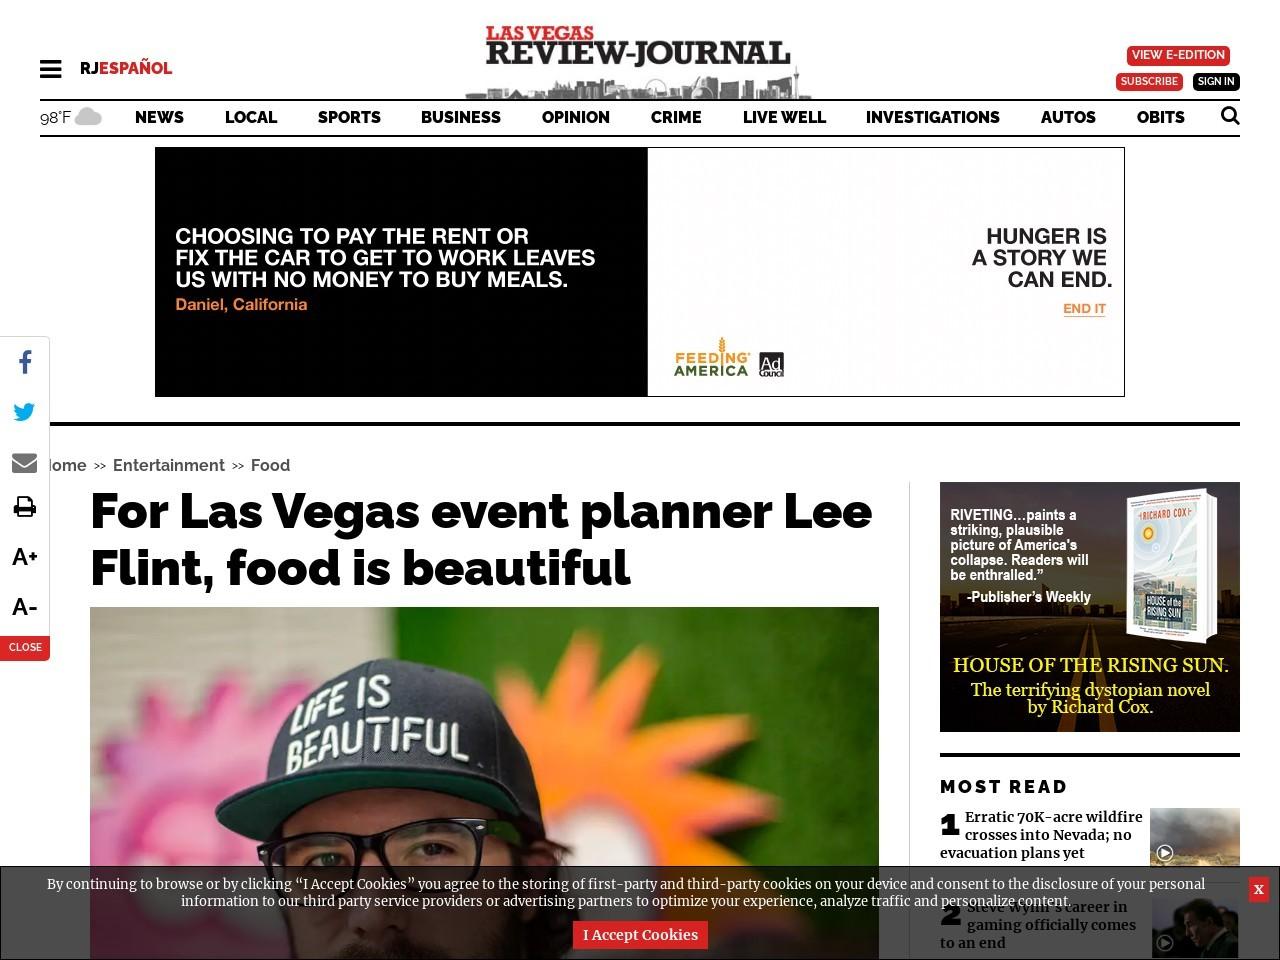 For Las Vegas event planner Lee Flint, food is beautiful